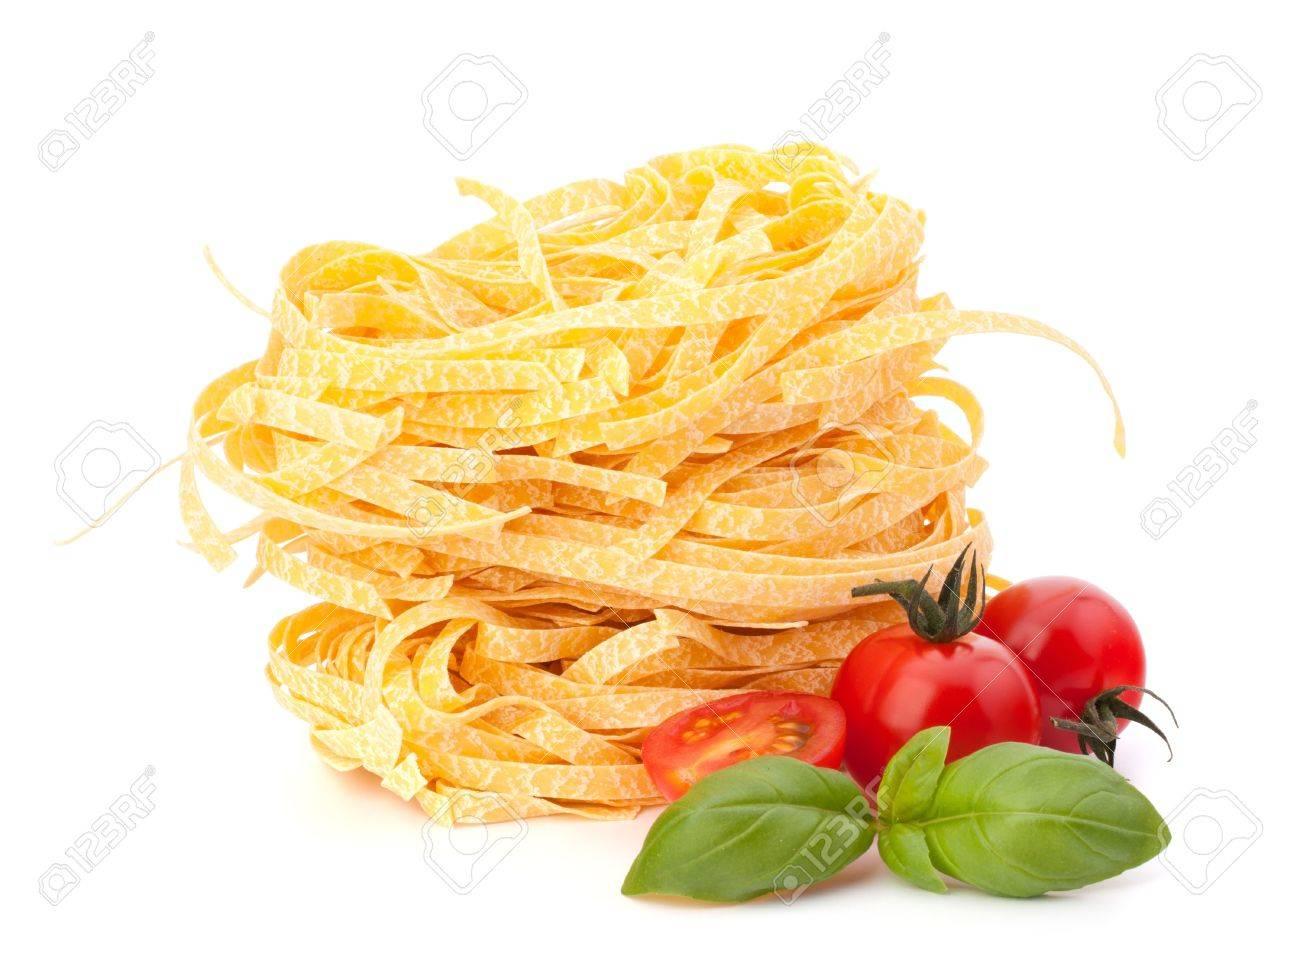 Italian pasta tagliatelle nest and cherry tomato isolated on white background Stock Photo - 13298382